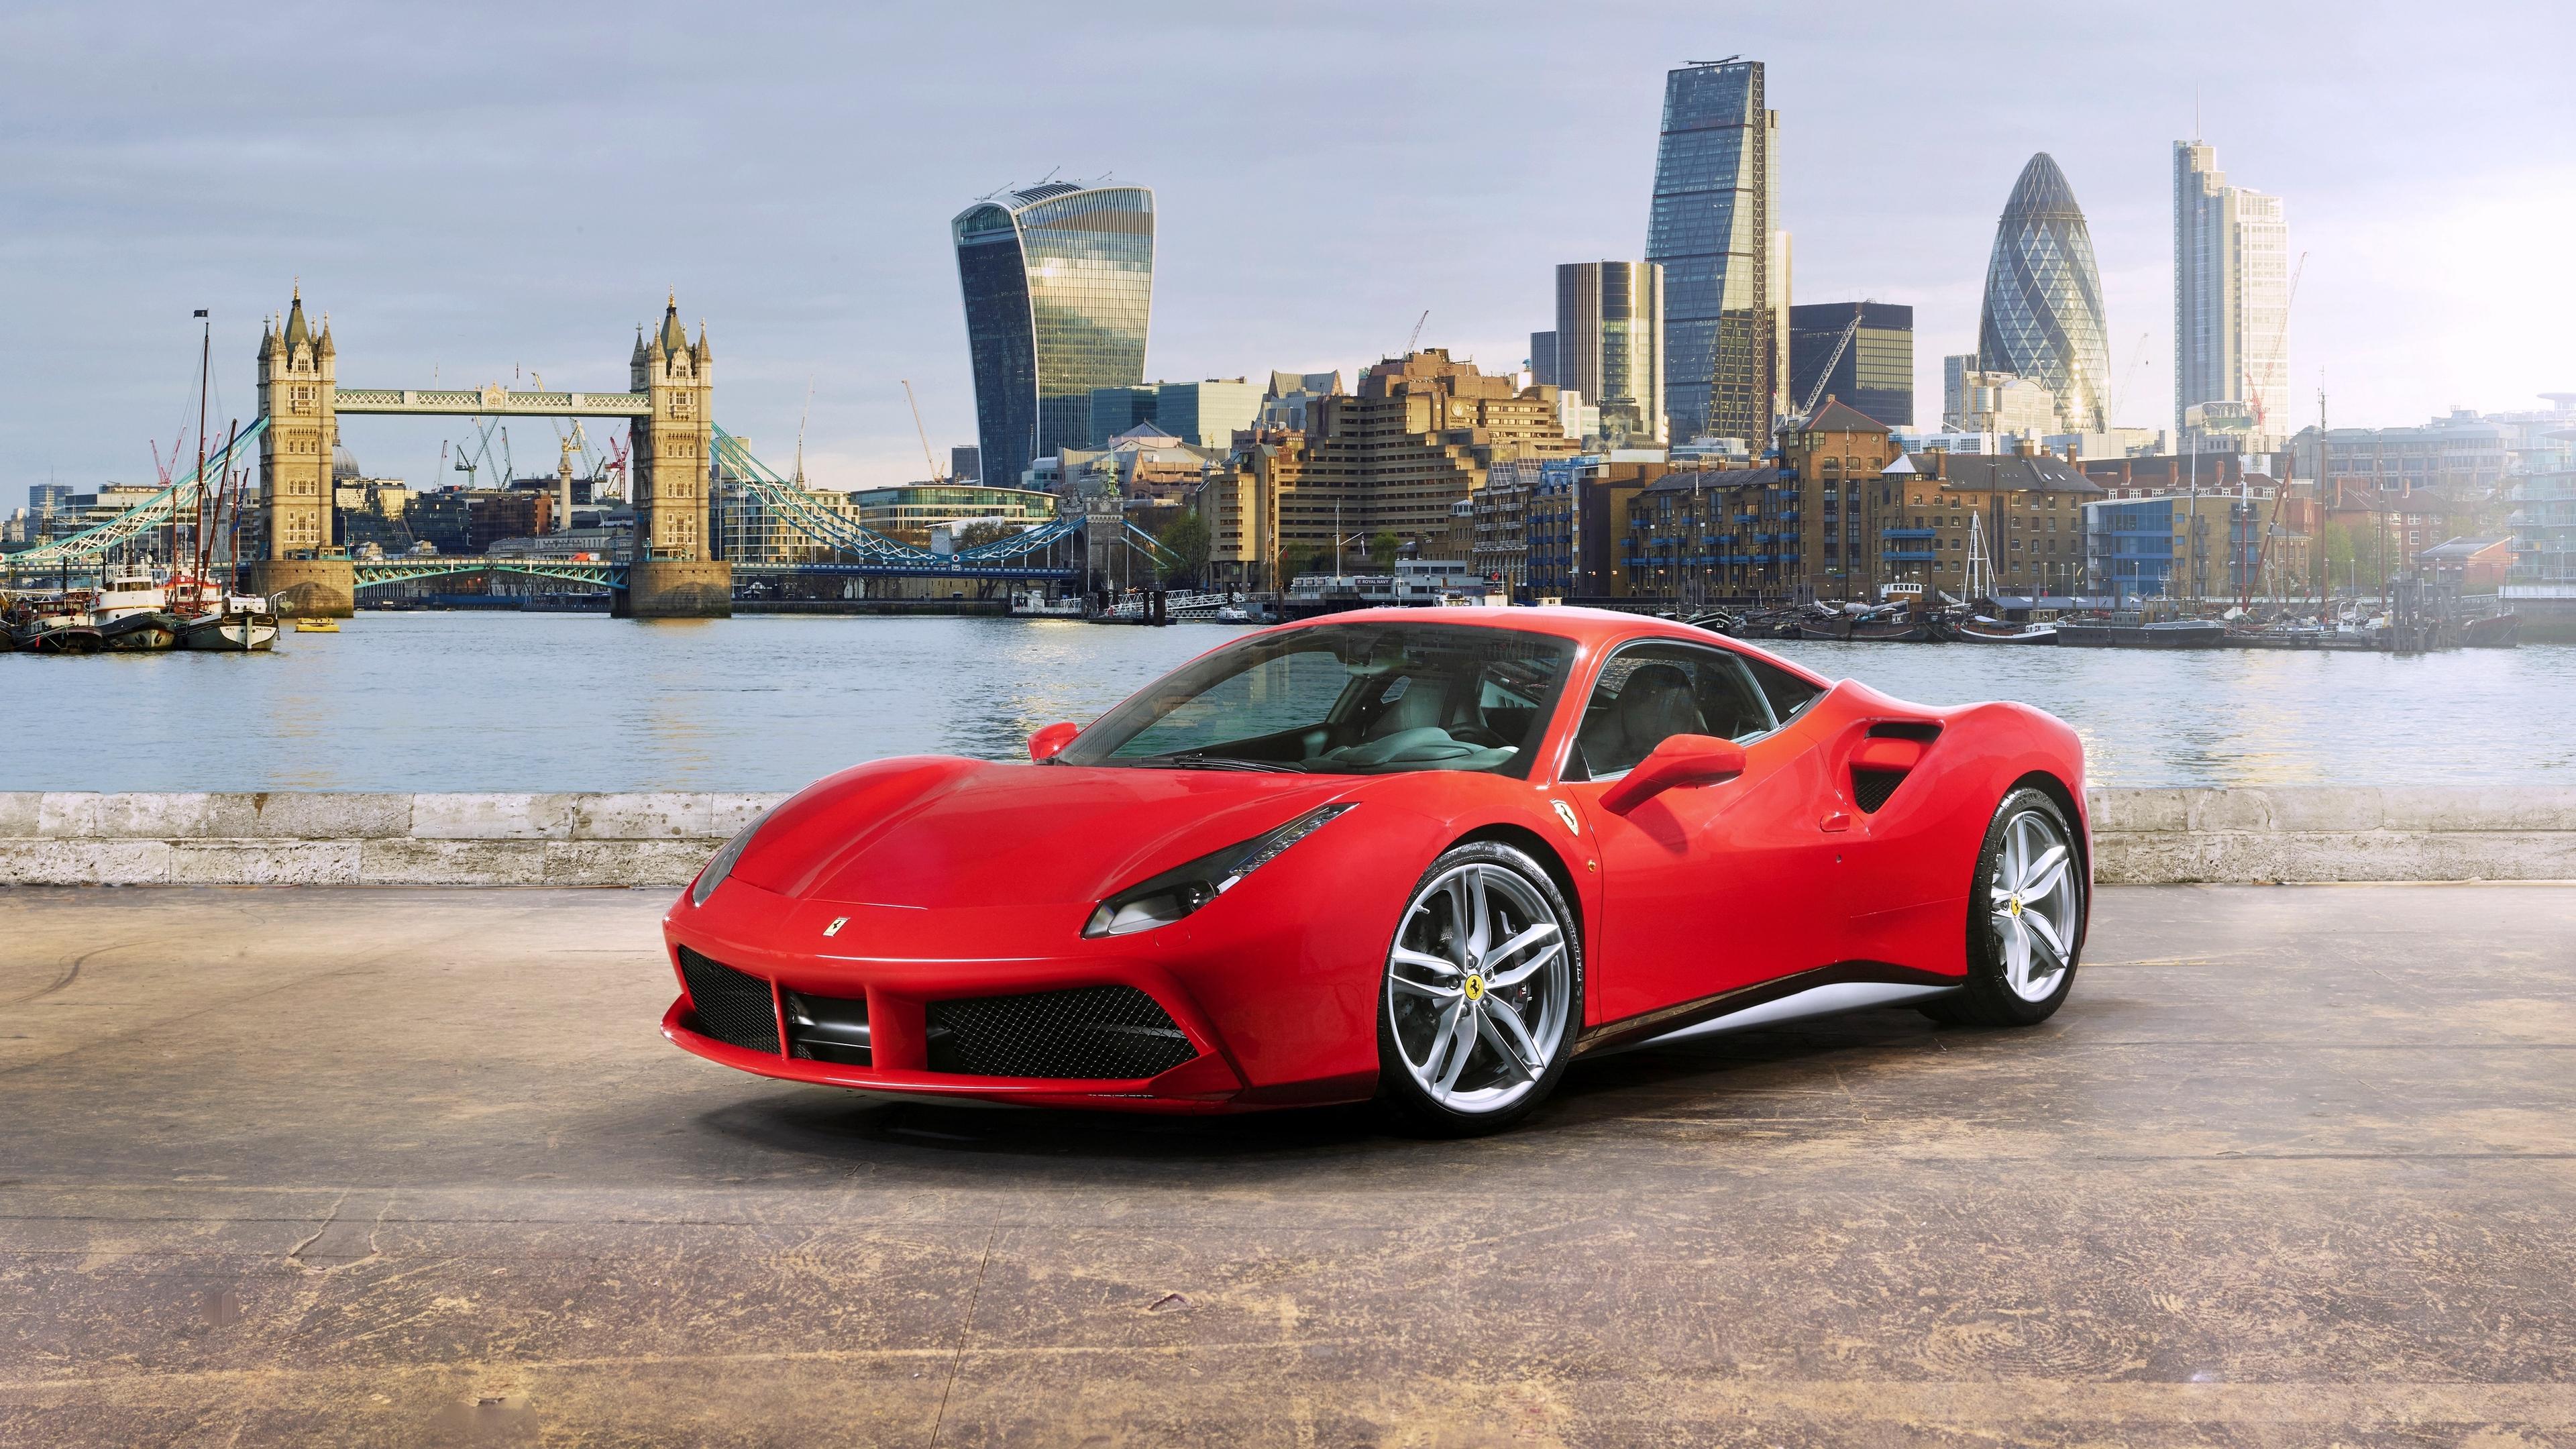 ferrari 488 gtb red side view 4k 1538934860 - ferrari, 488 gtb, red, side view 4k - red, Ferrari, 488 gtb